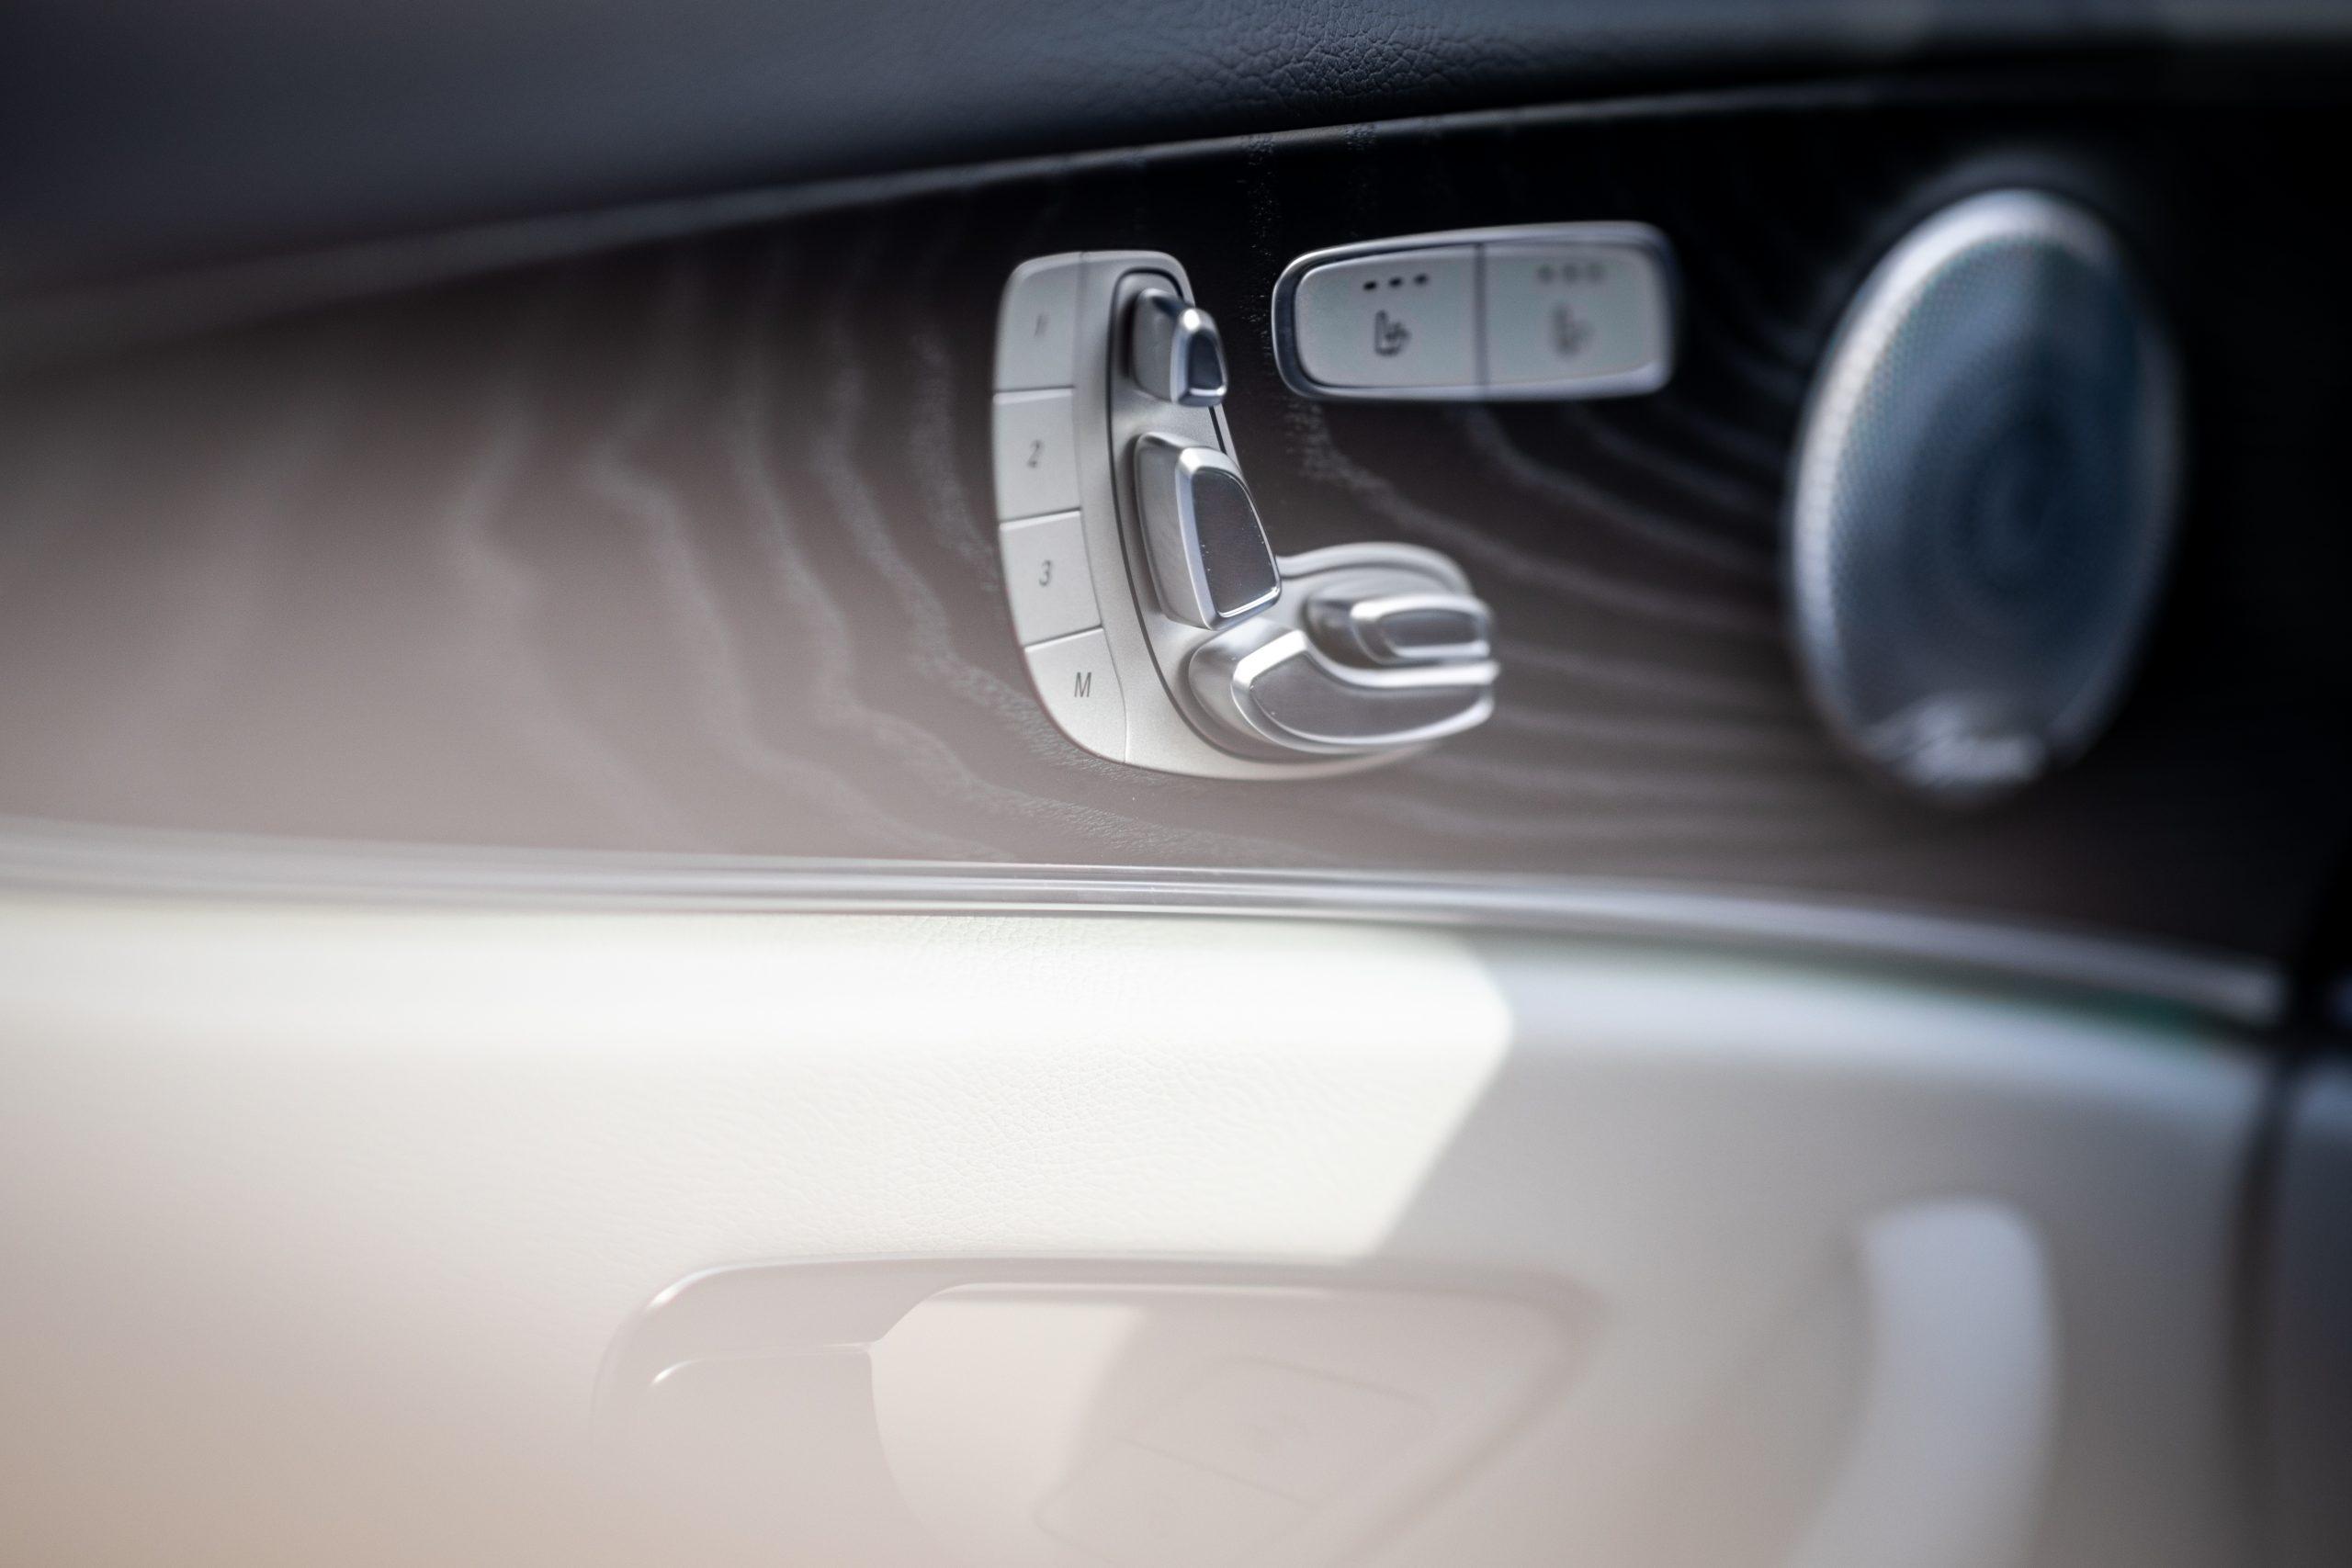 2021 Mercedes Benz E 450 4MATIC seat button control